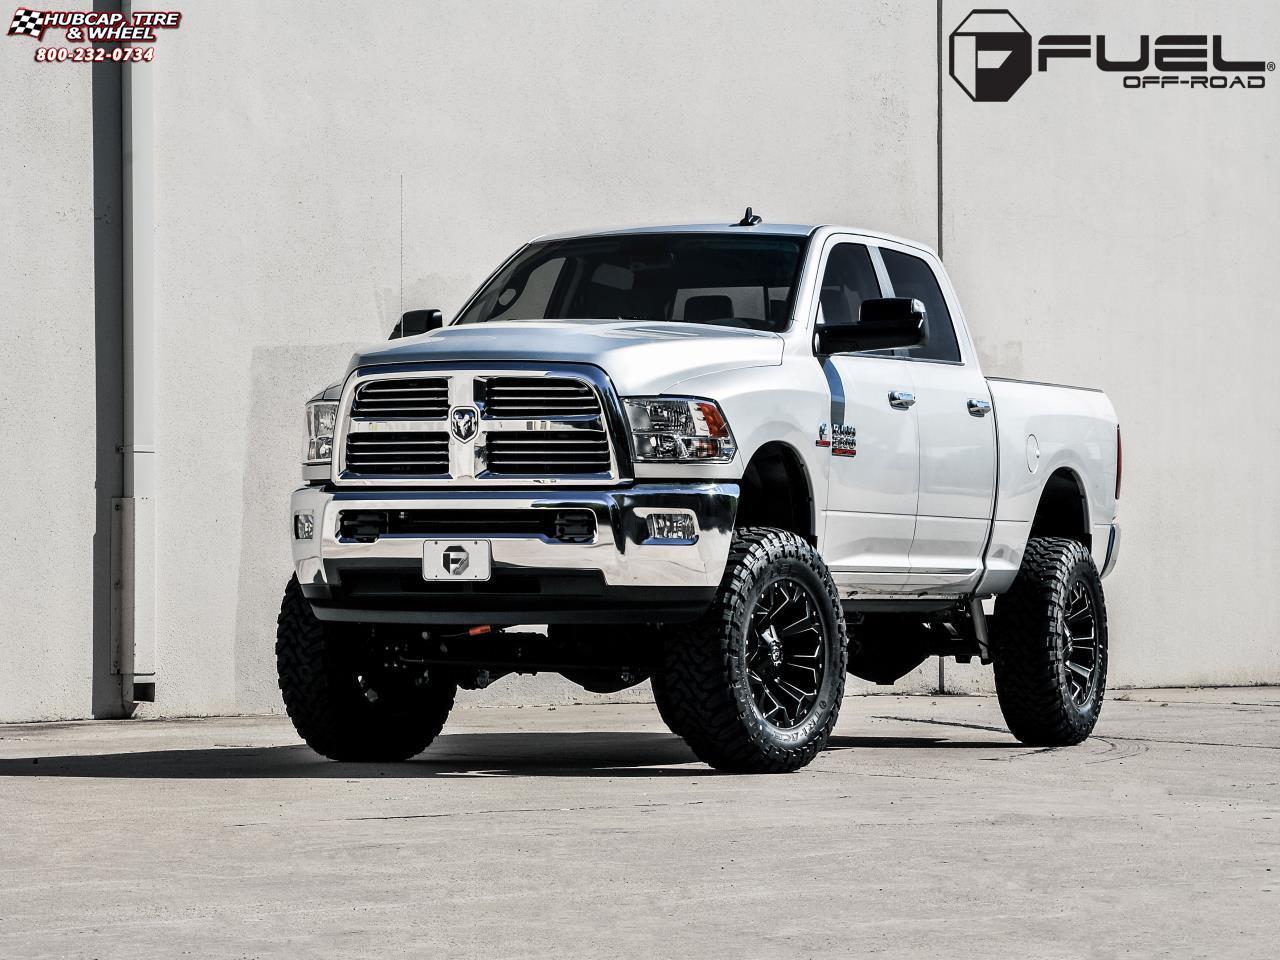 Dodge ram 2500 fuel assault d546 20x10 black milled wheels and rims